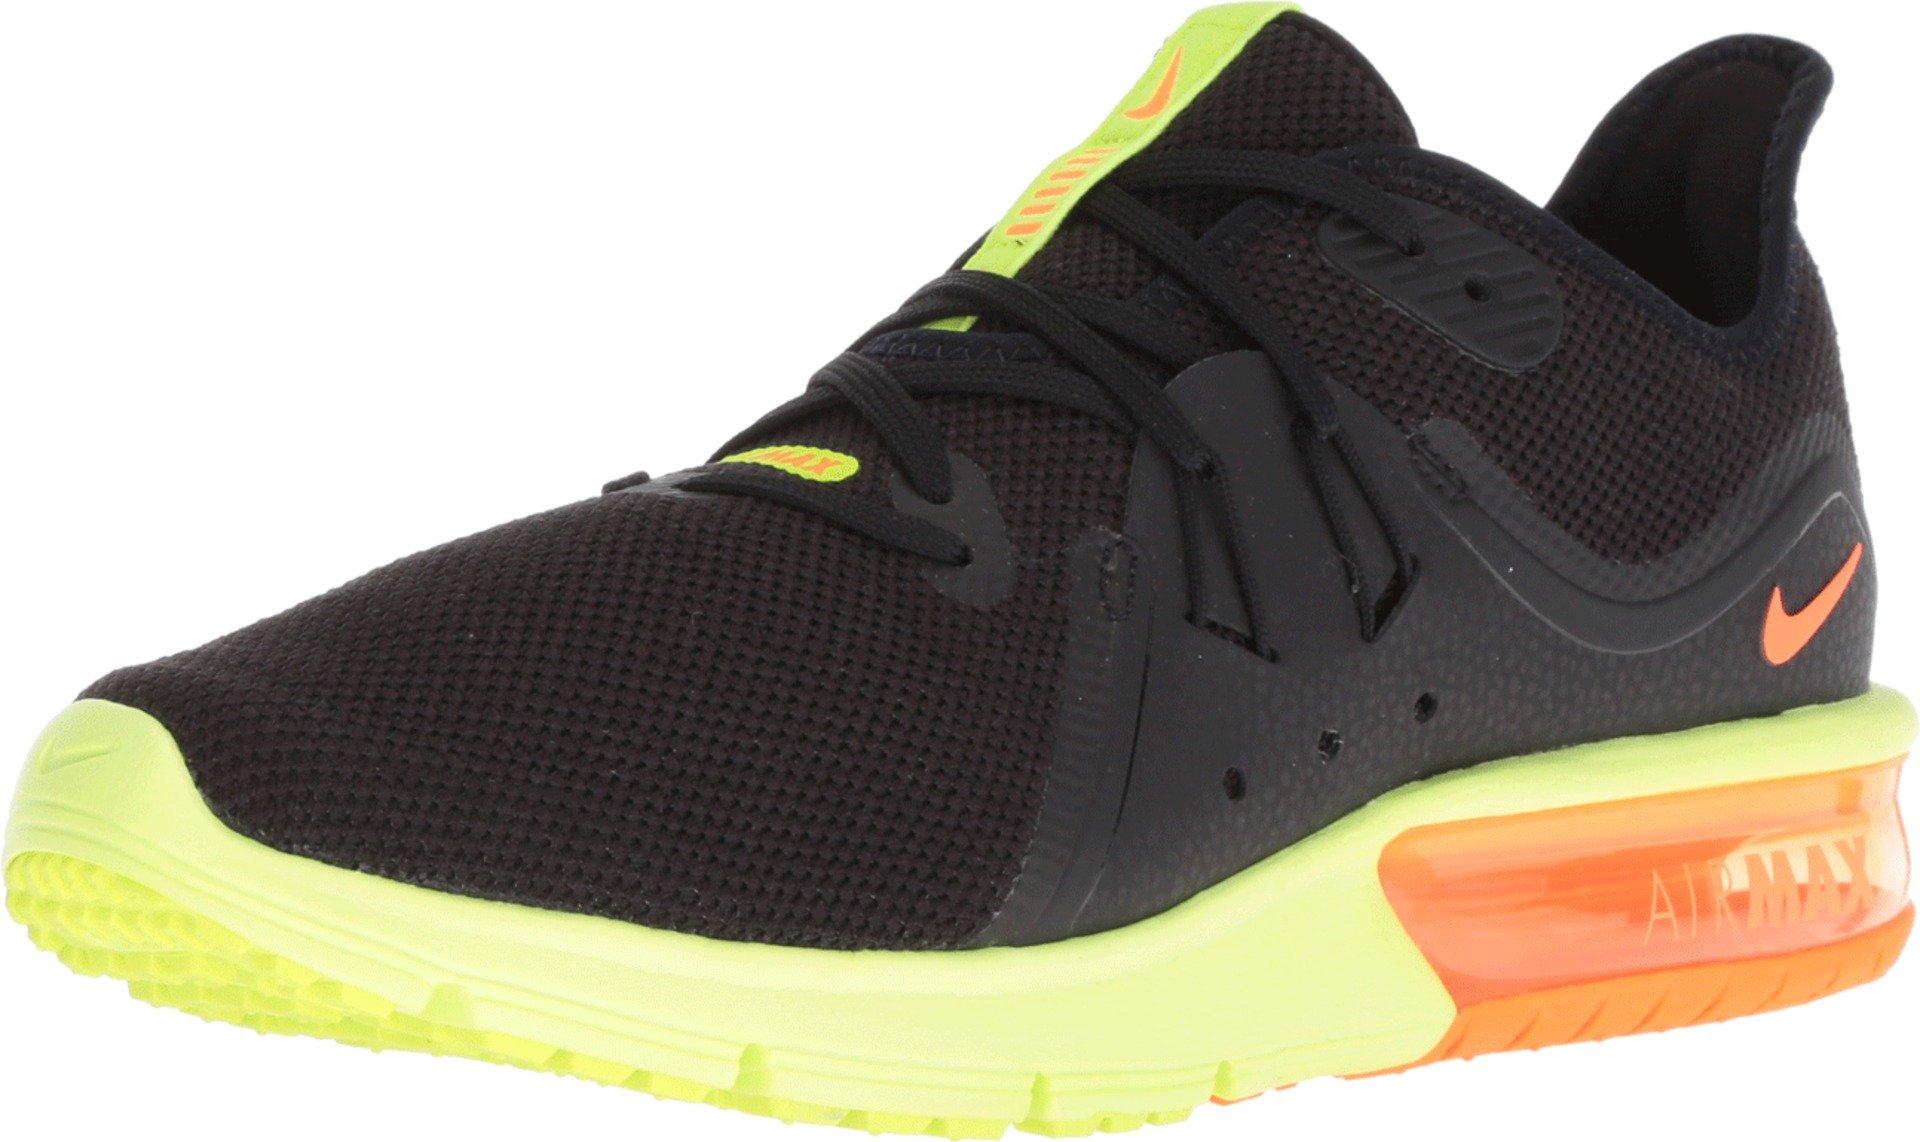 Nike Men's Air Max Sequent 3 Running Shoes (BlackTotal Orange Volt, 9 D(M) US)